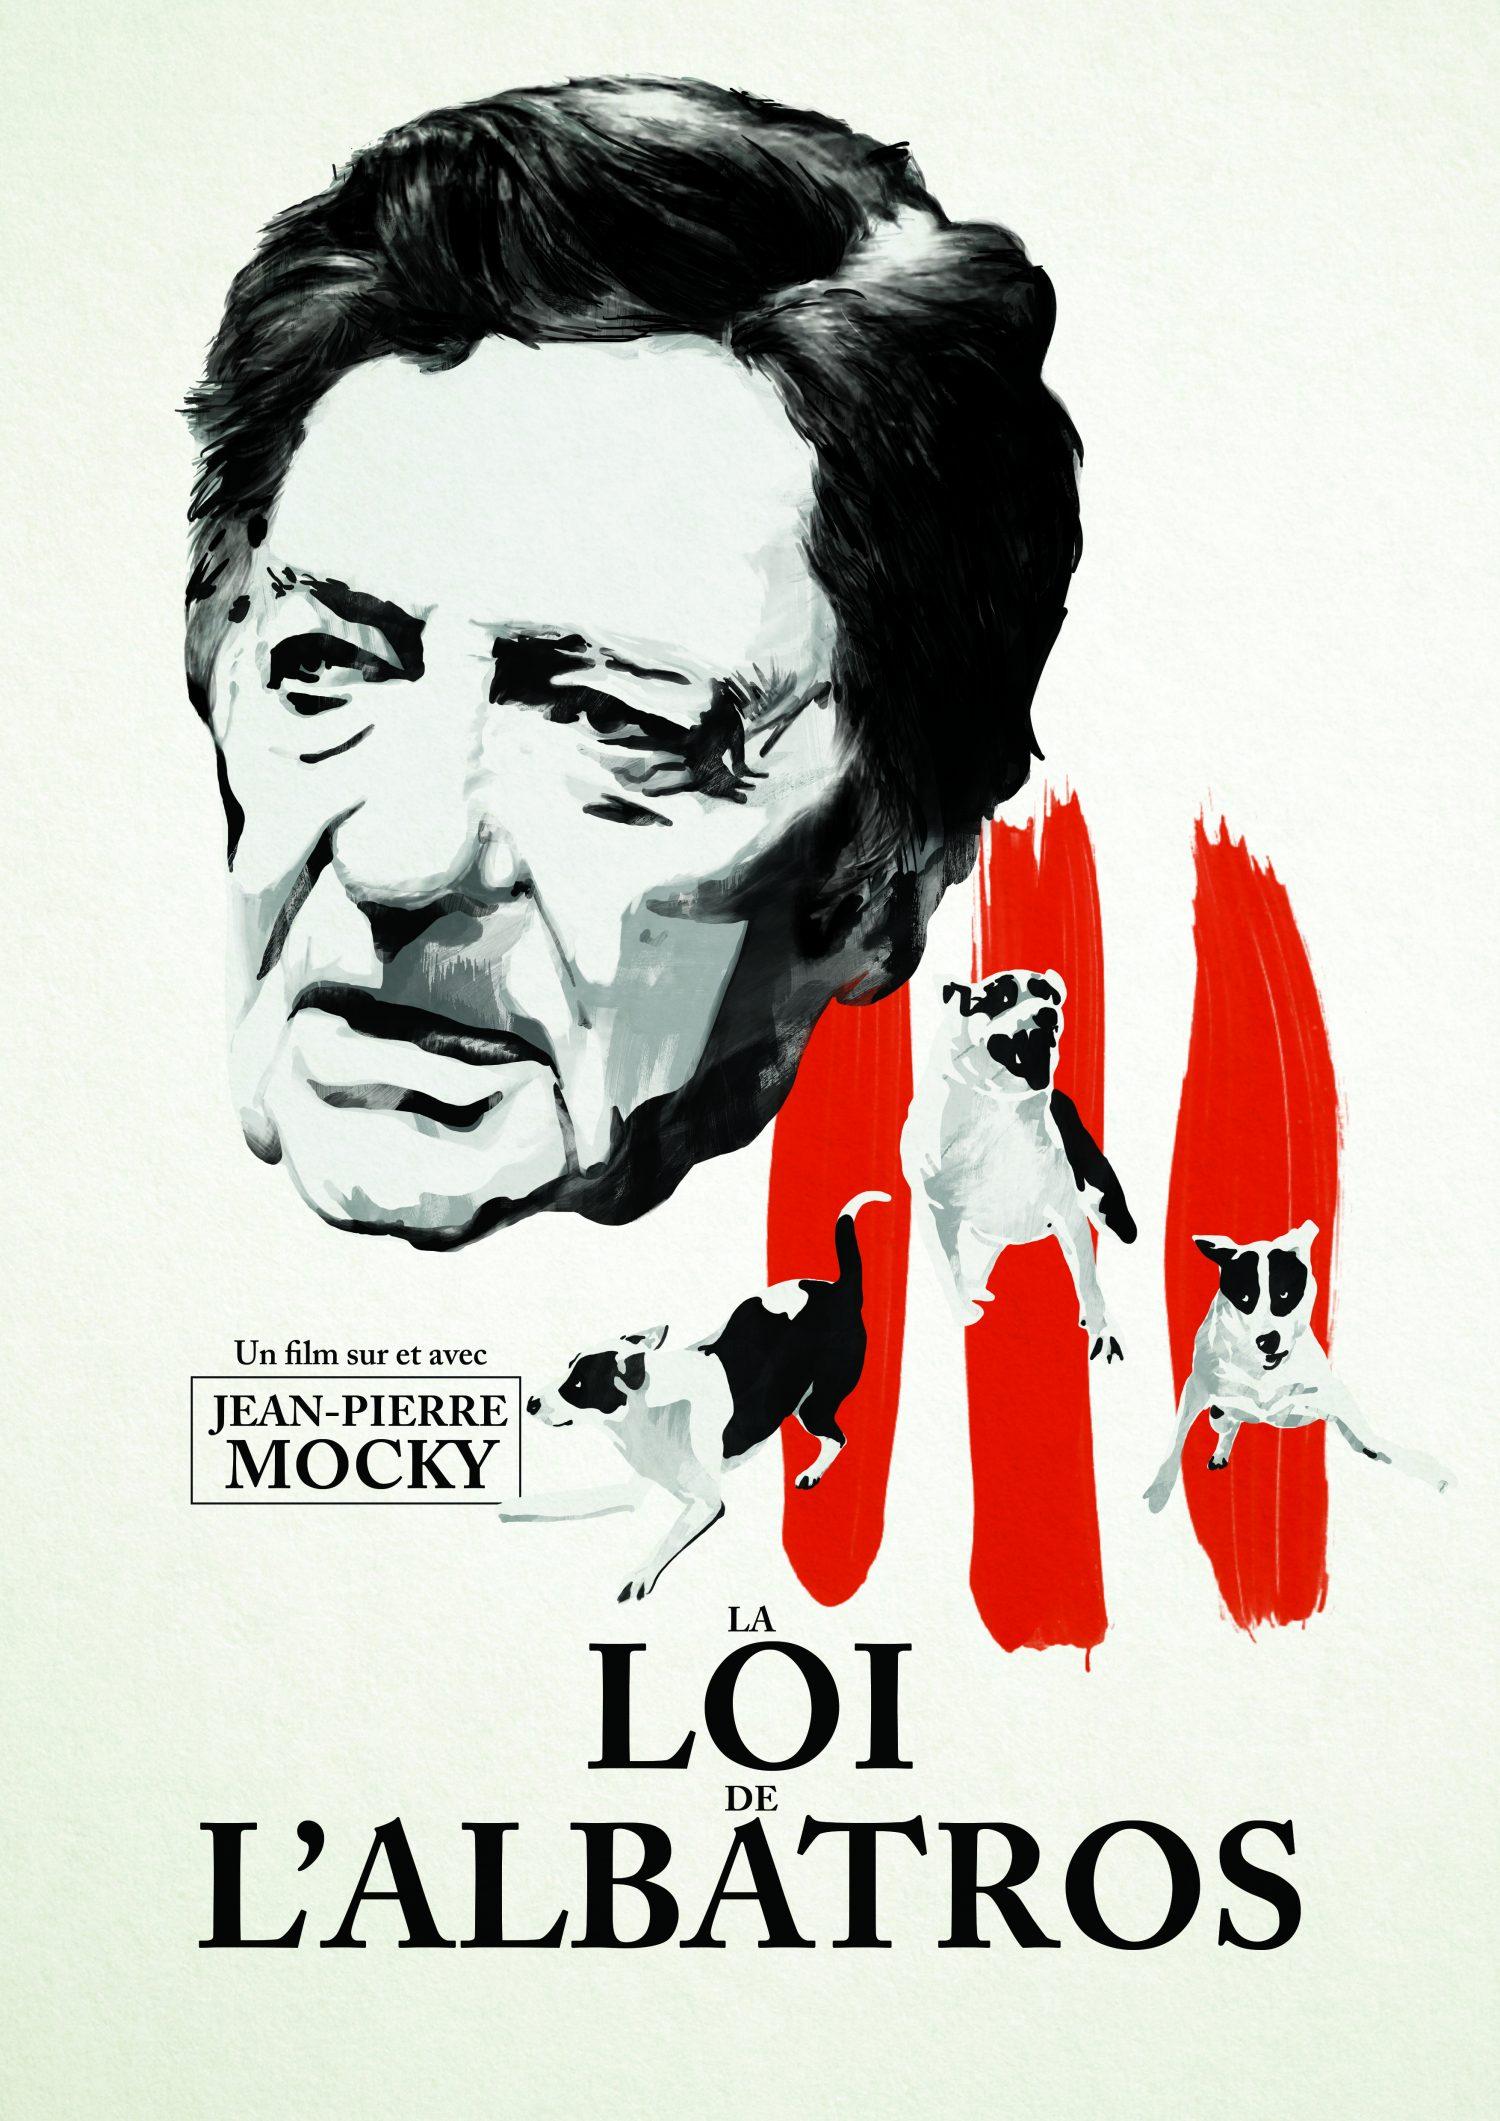 LES FILMS DU LONDINE